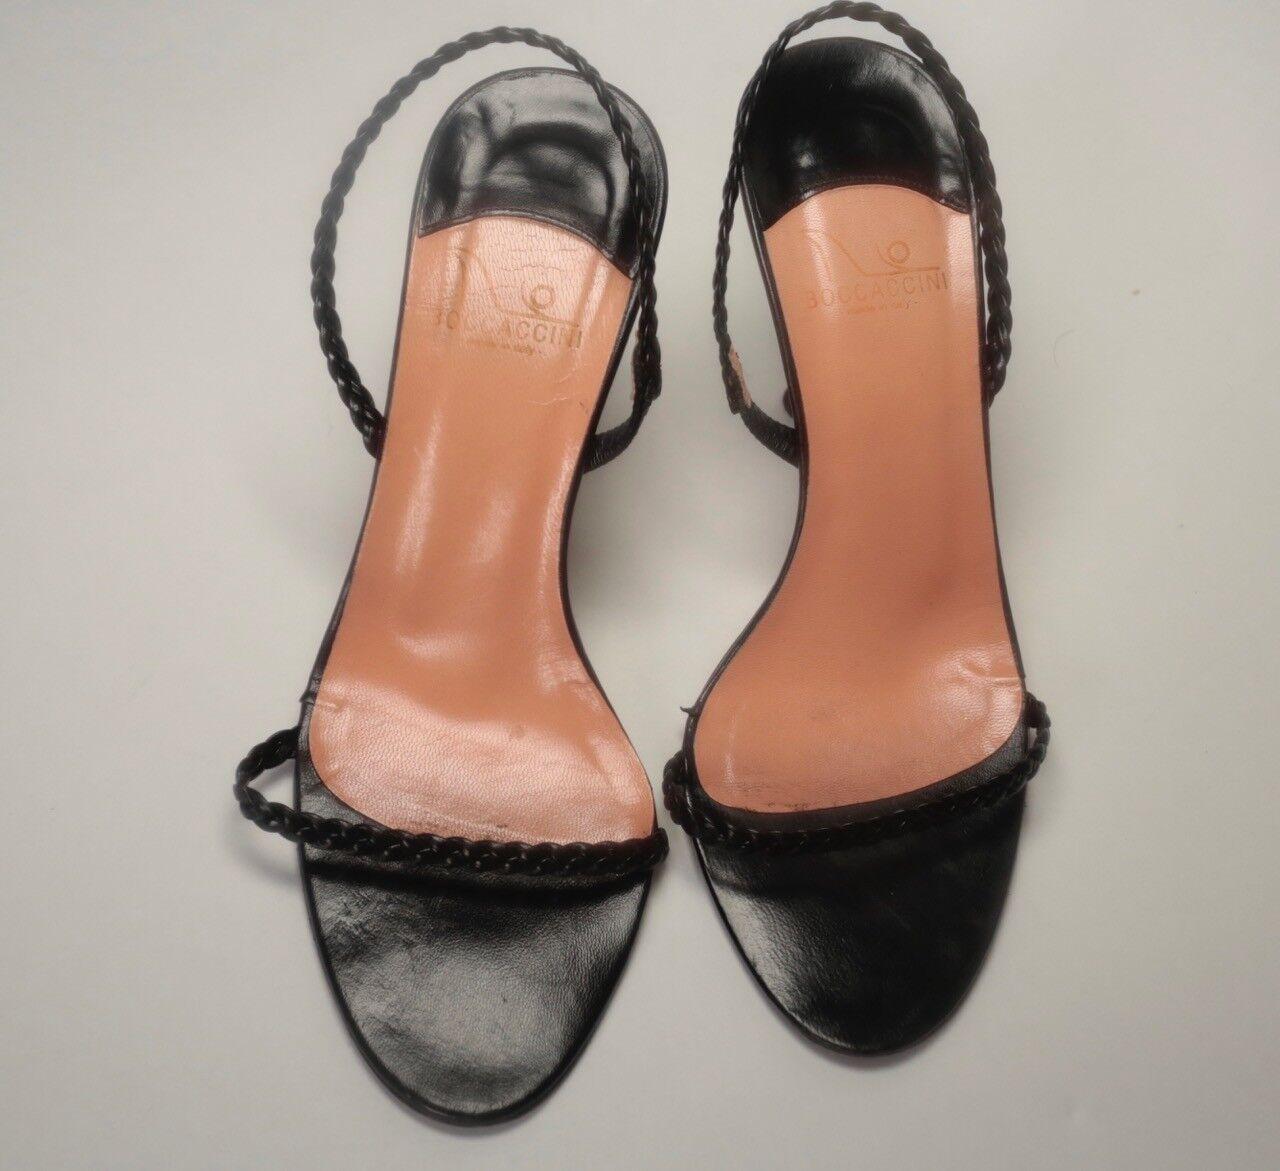 Boccacini schwarz Leder heels with straps braided straps with 4ae72b